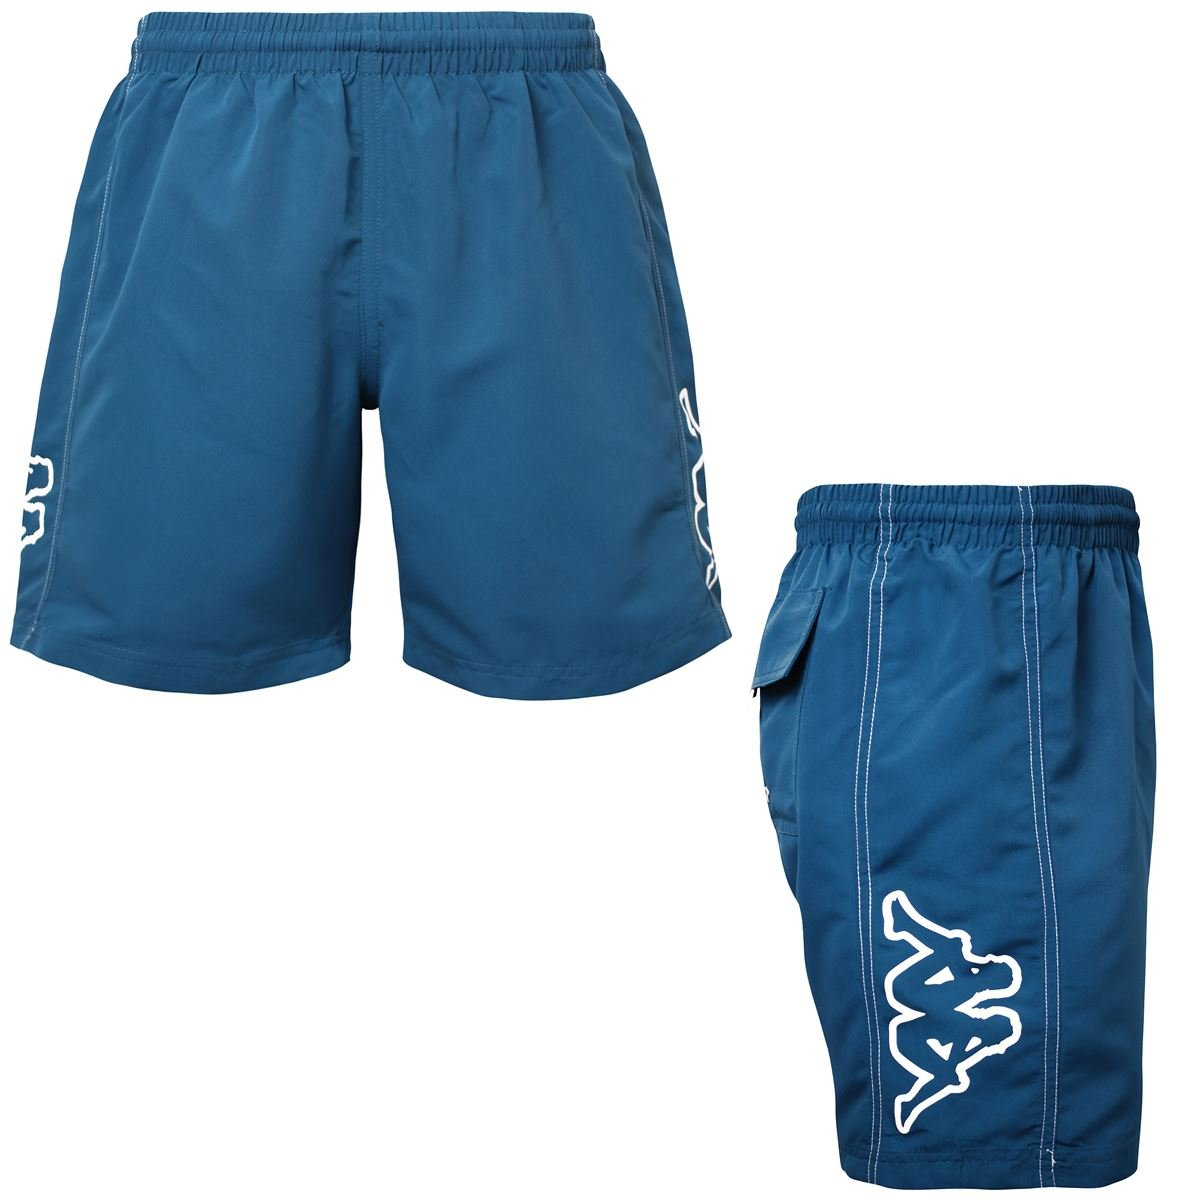 04be83ccd Kappa Men's Swimming Shorts Blue Blue Petrol - Blue - Medium: Amazon ...